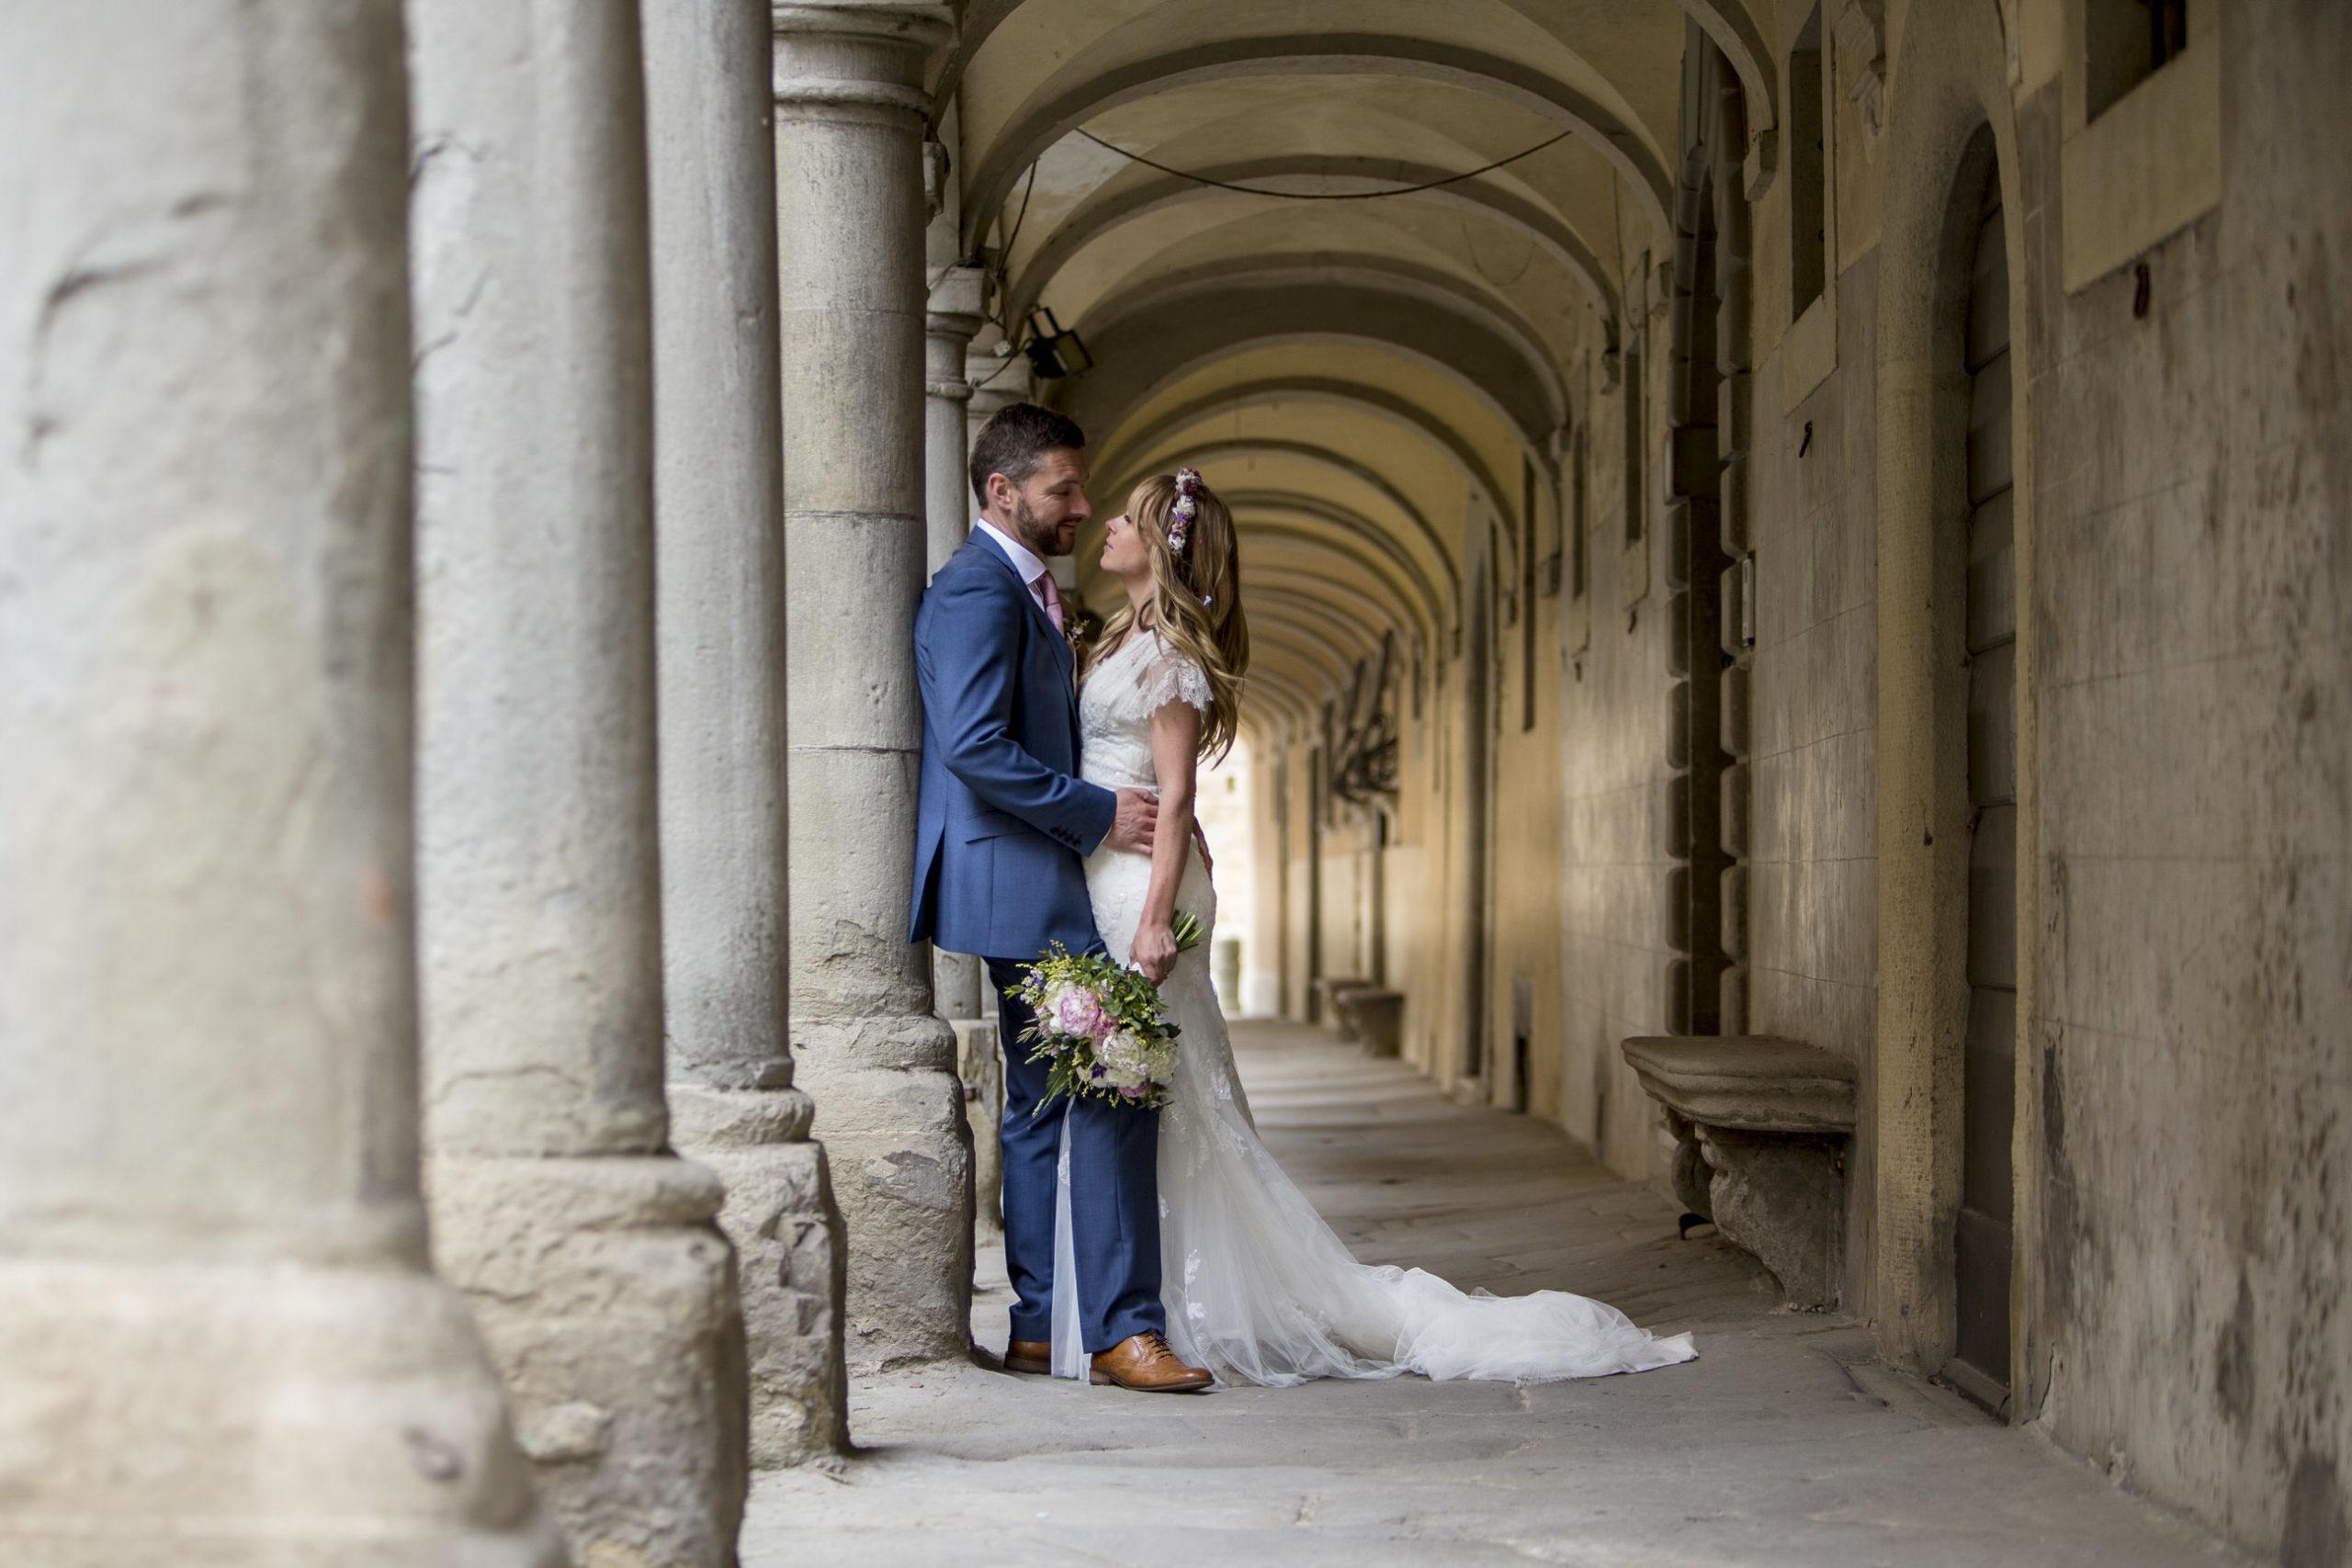 A Destination Wedding Photographer's Pride